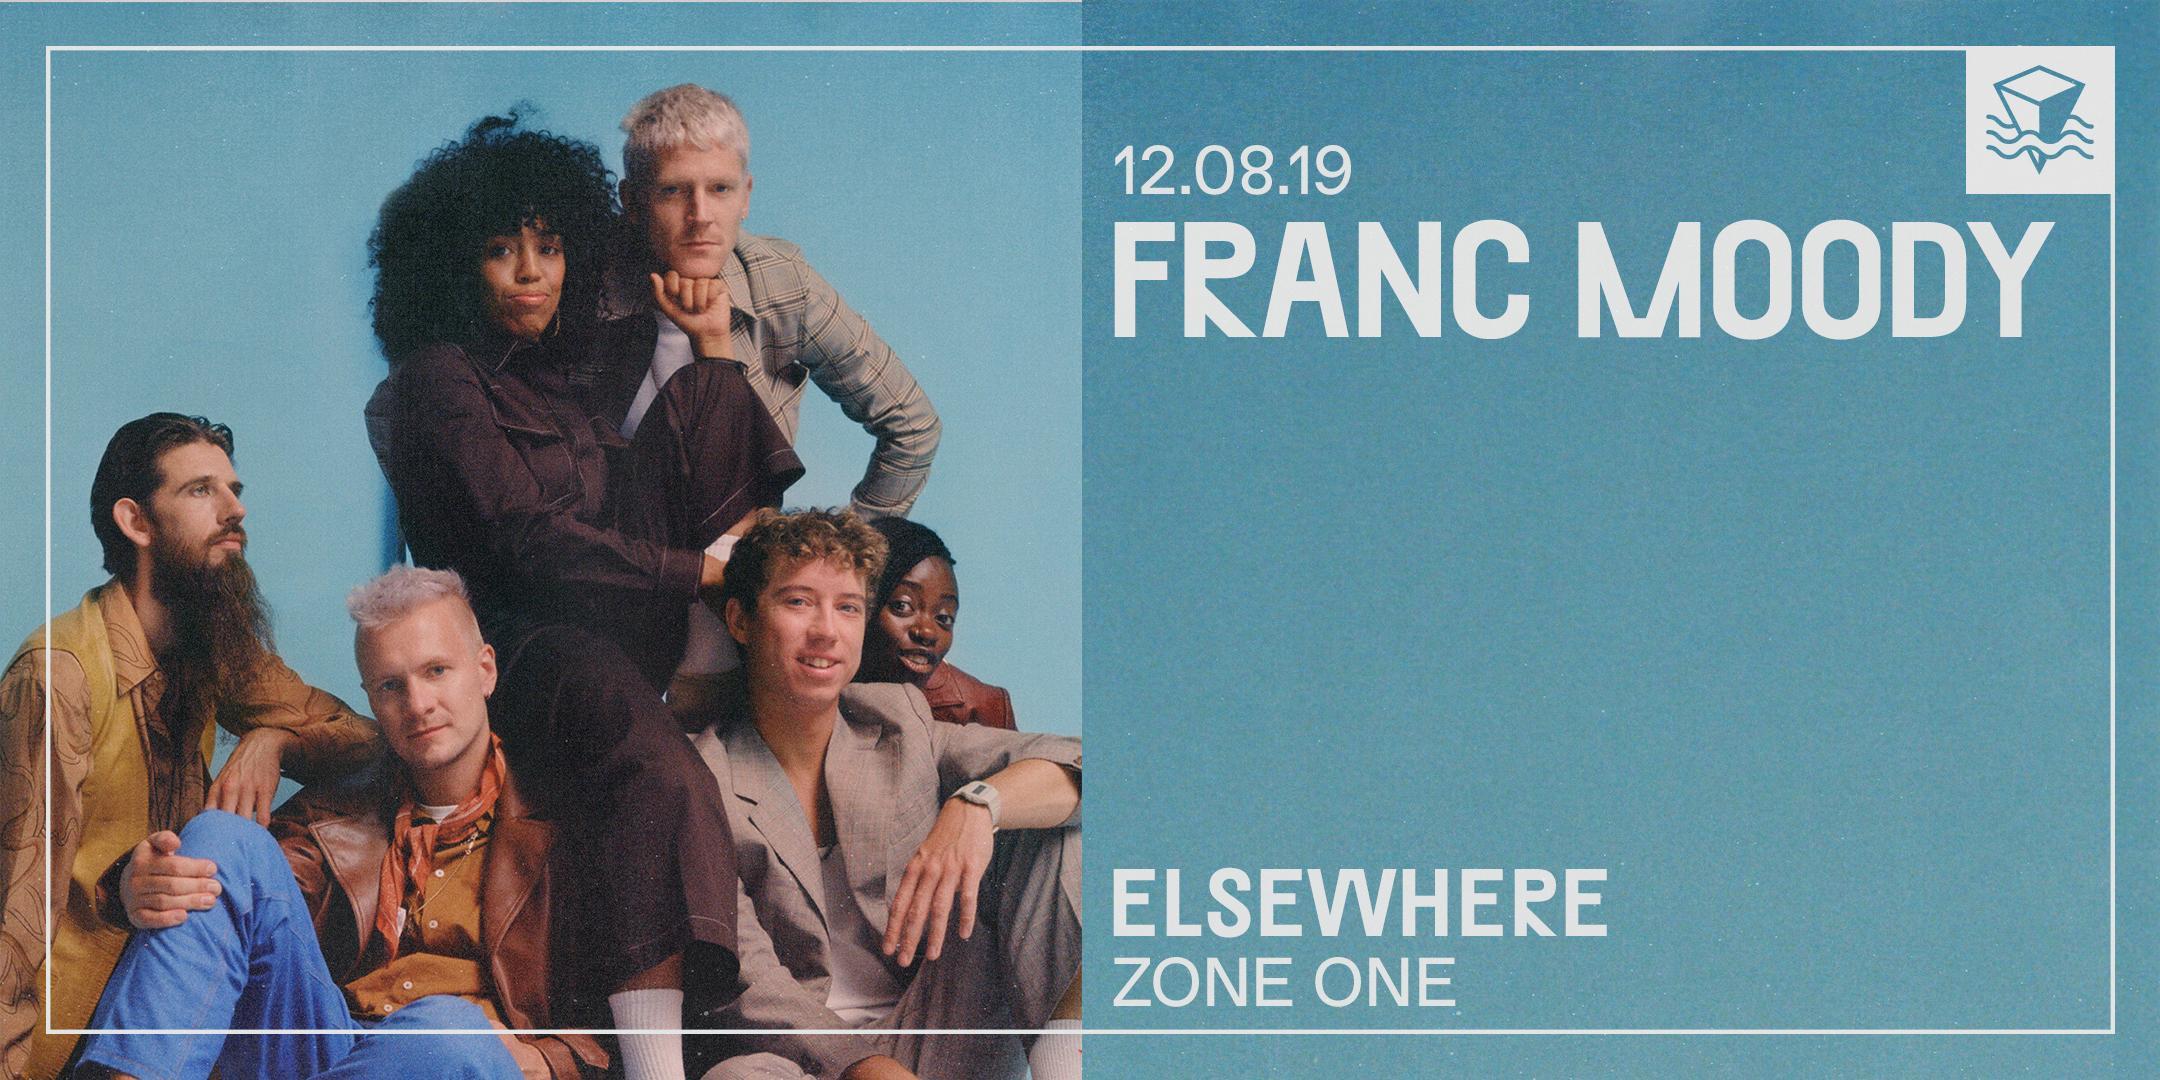 Franc Moody @ Elsewhere (Zone One)